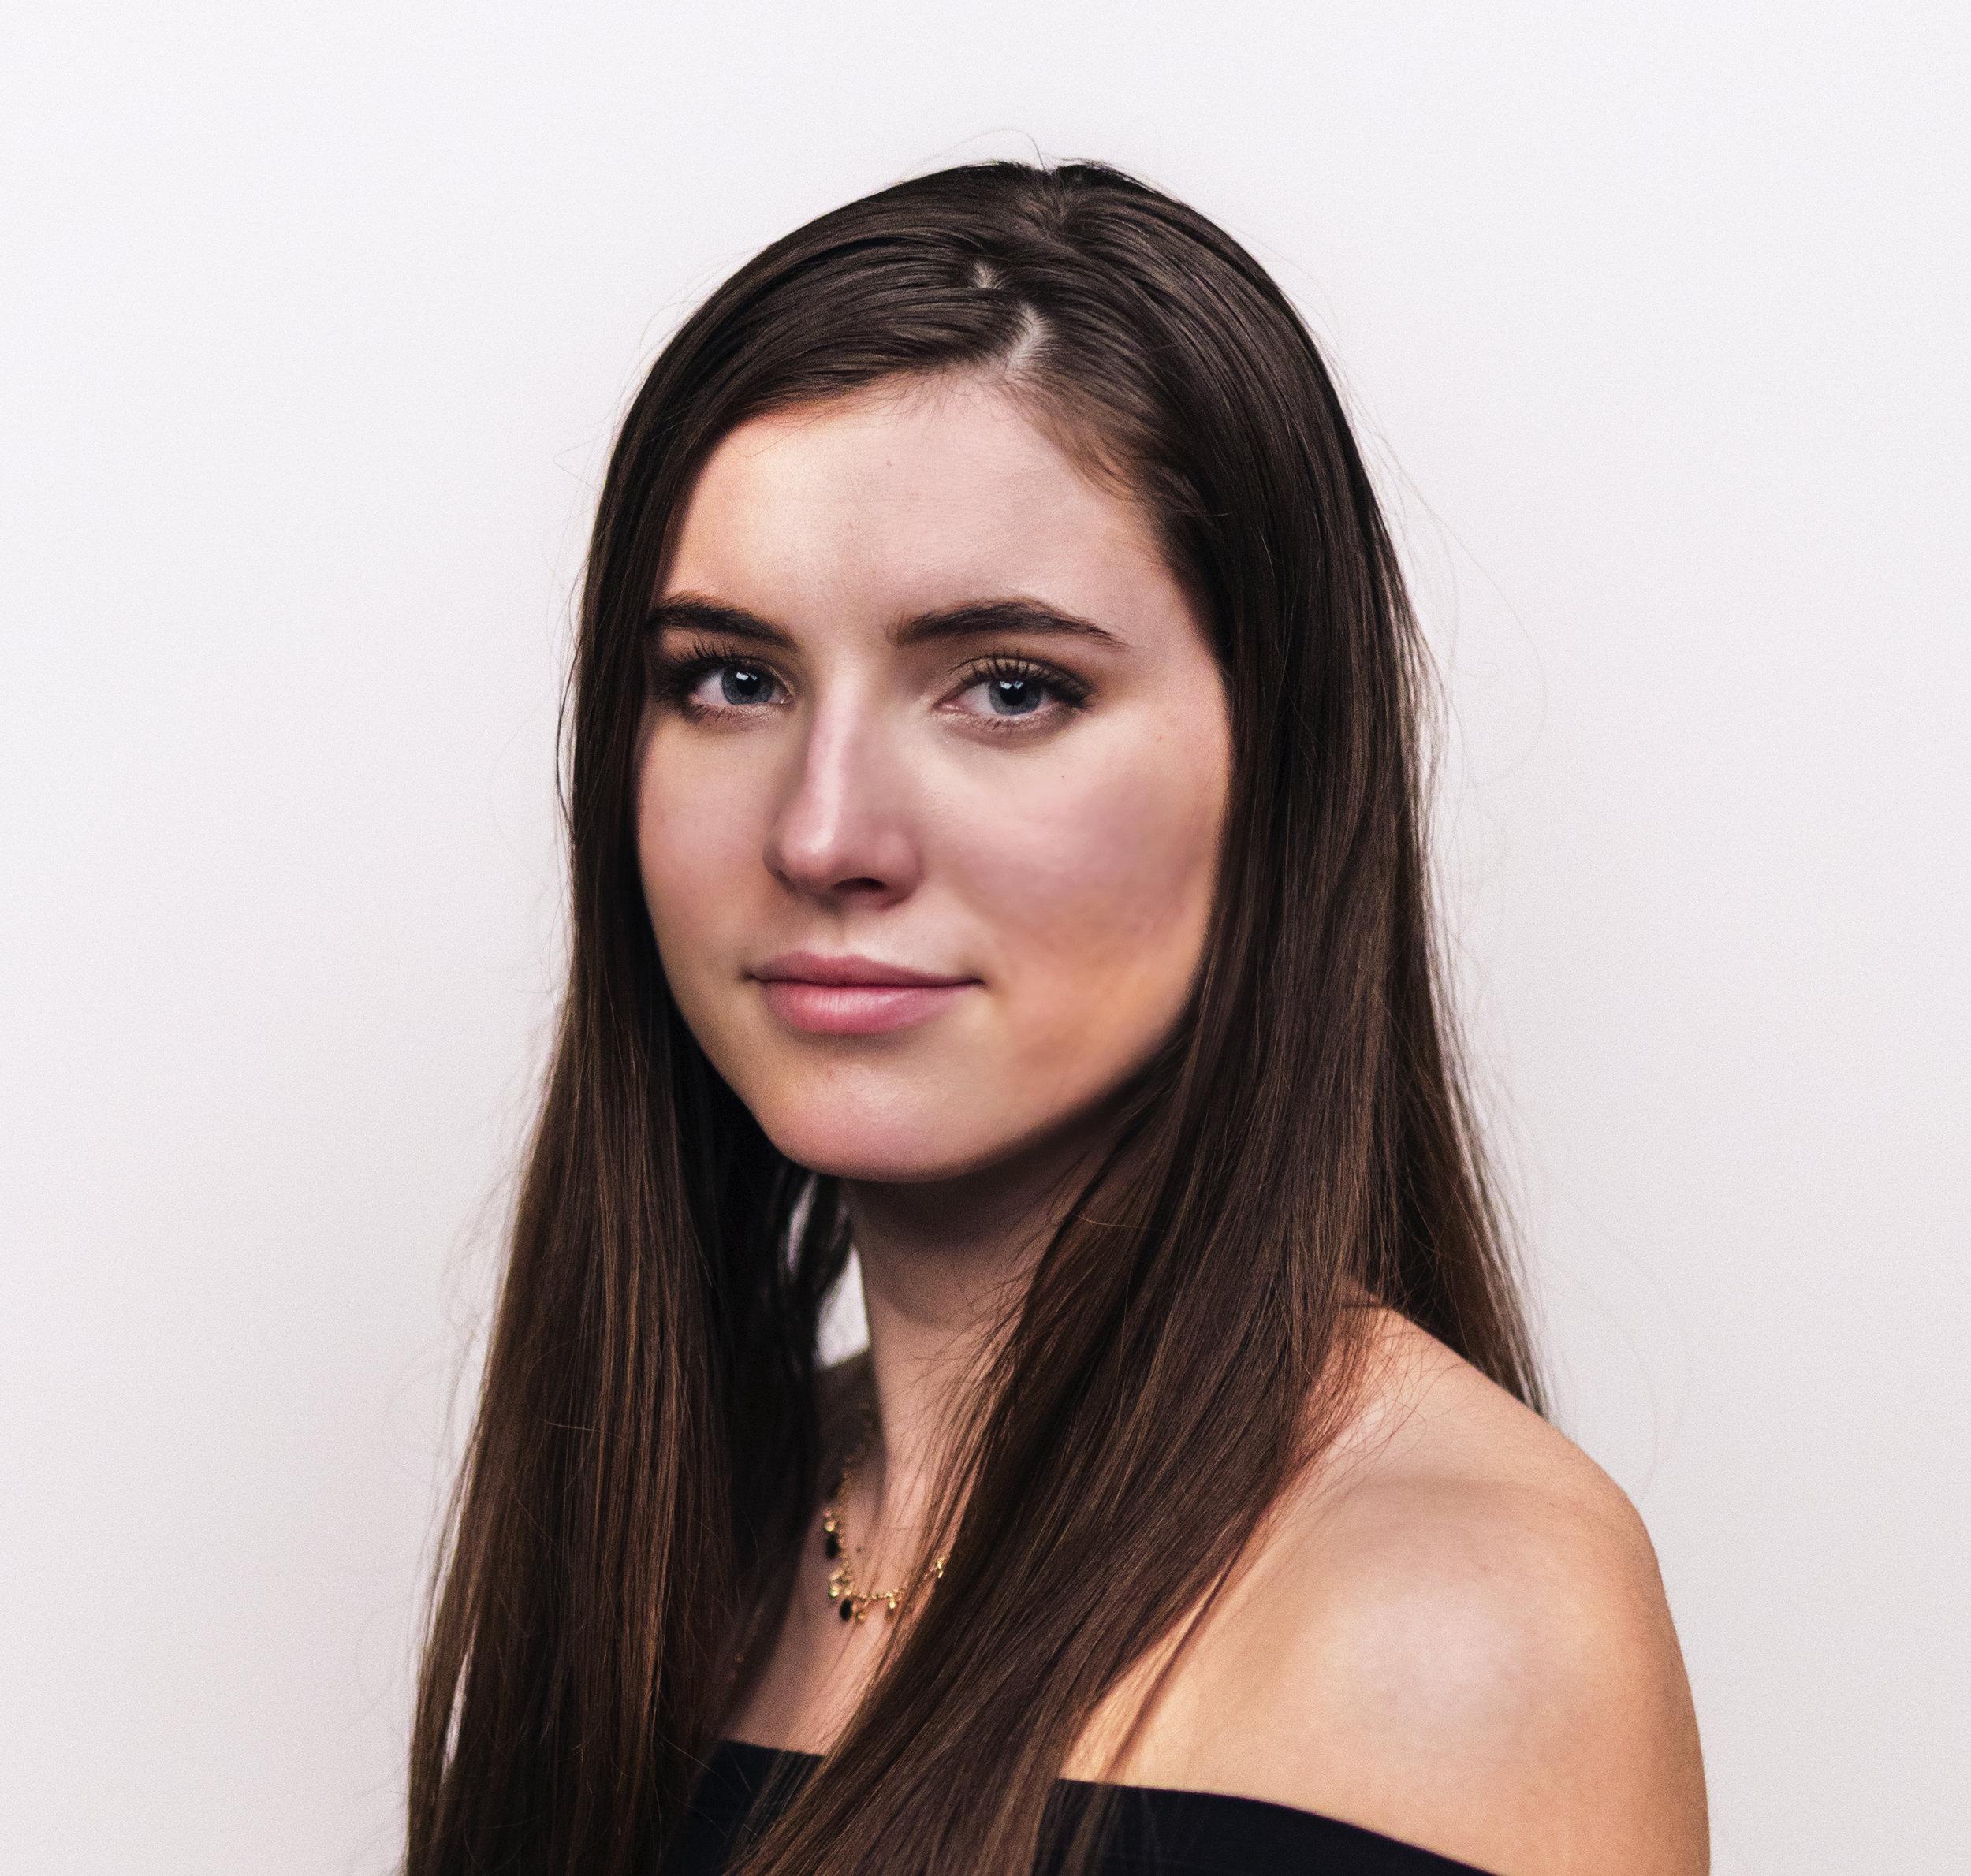 Tessa More